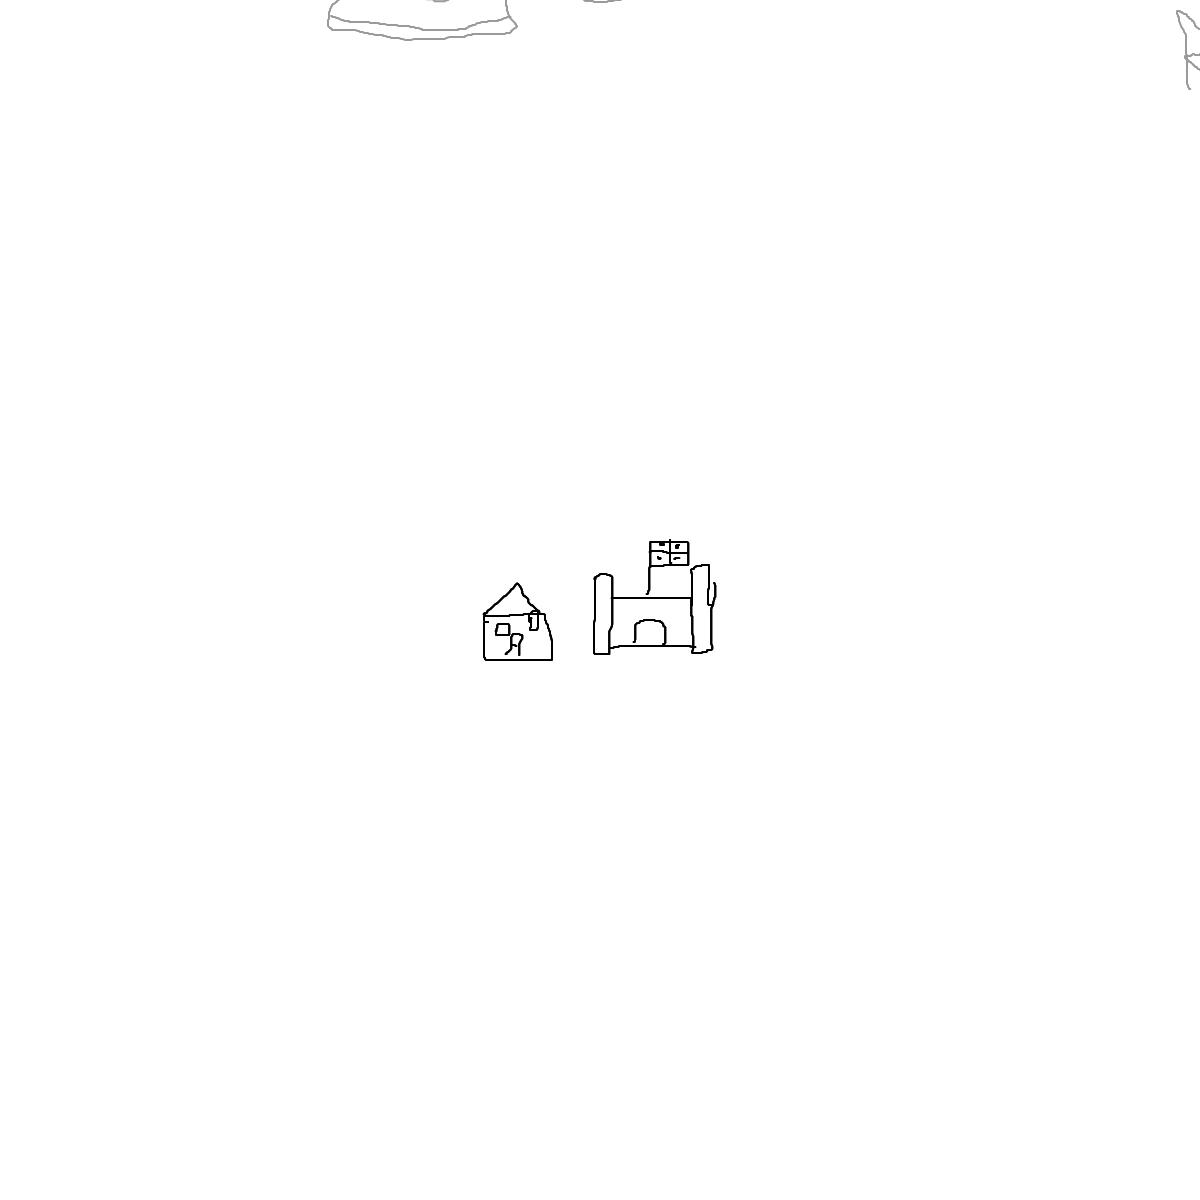 BAAAM drawing#724 lat:-45.0426254272460940lng: 169.1999359130859400